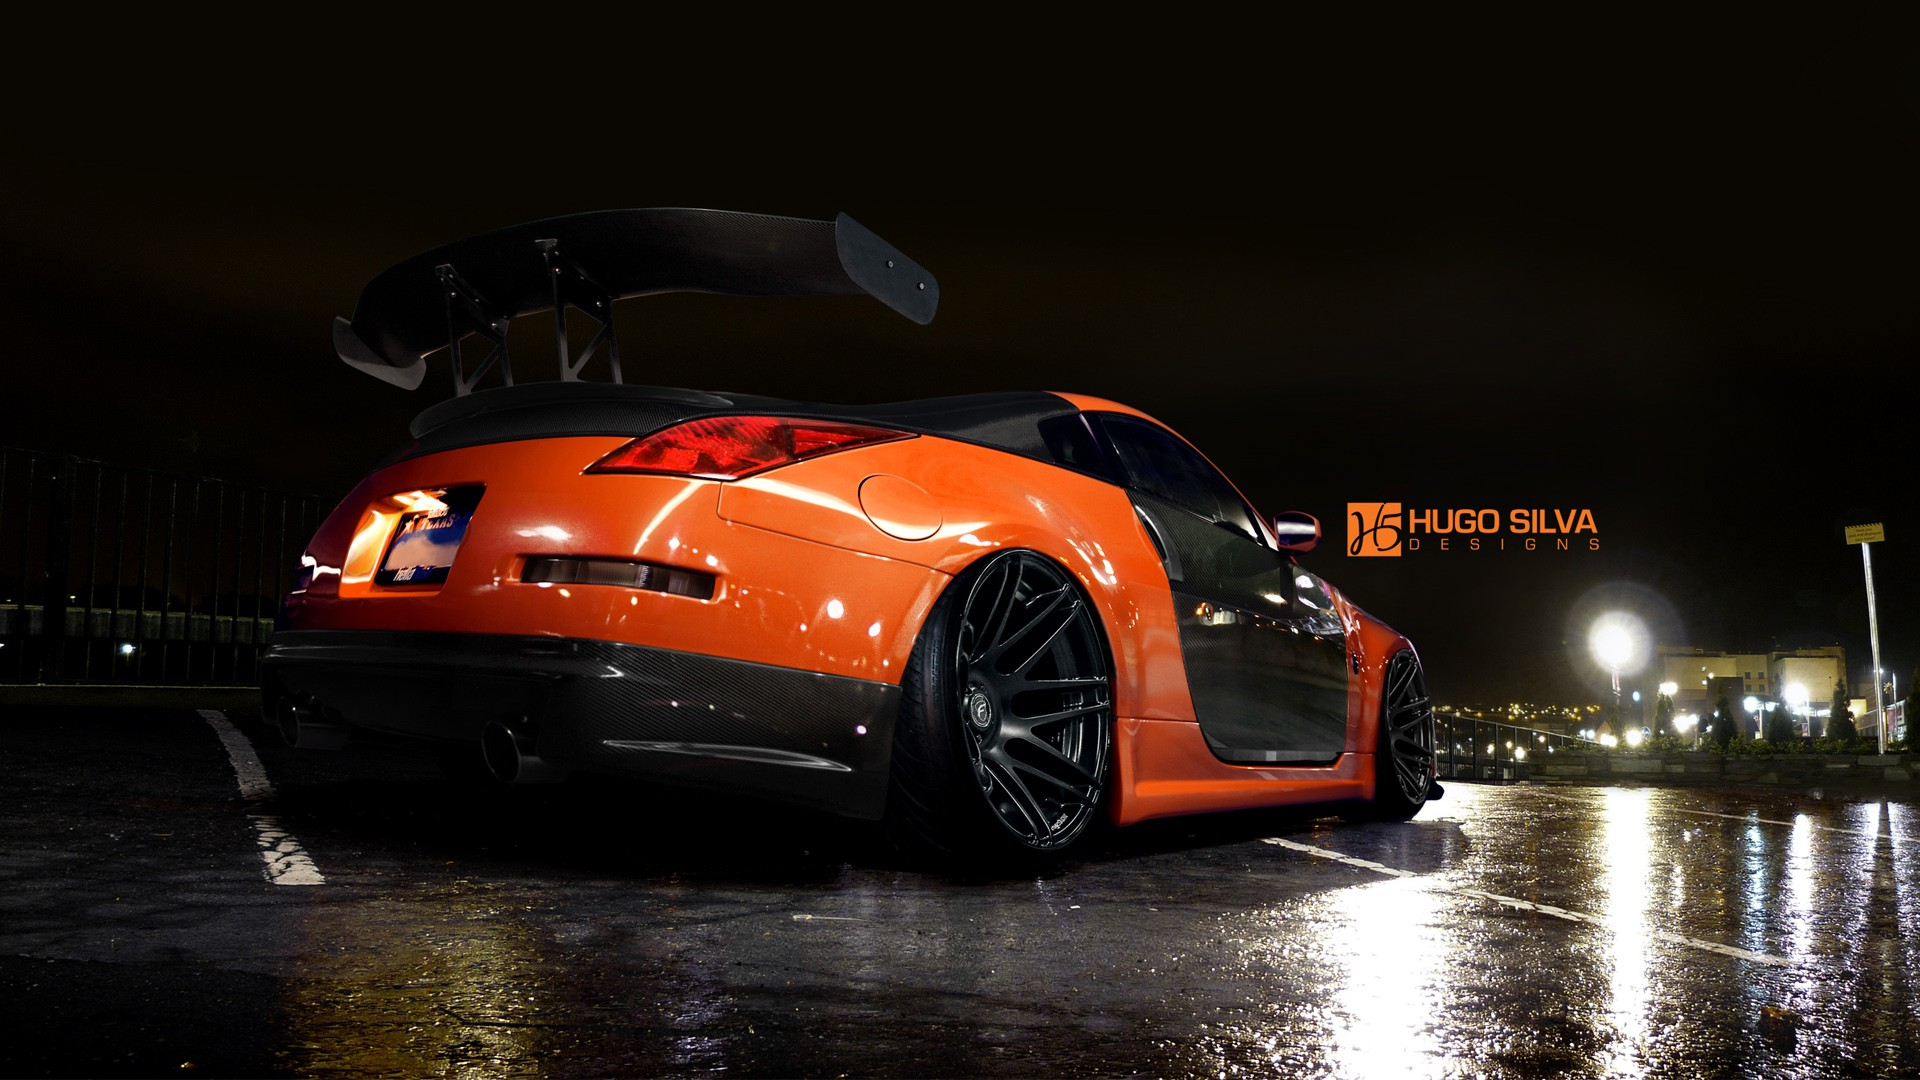 Latest Car Wallpaper 2014 Orange Nissan 350z Wallpaper Hd Car Wallpapers Id 4915